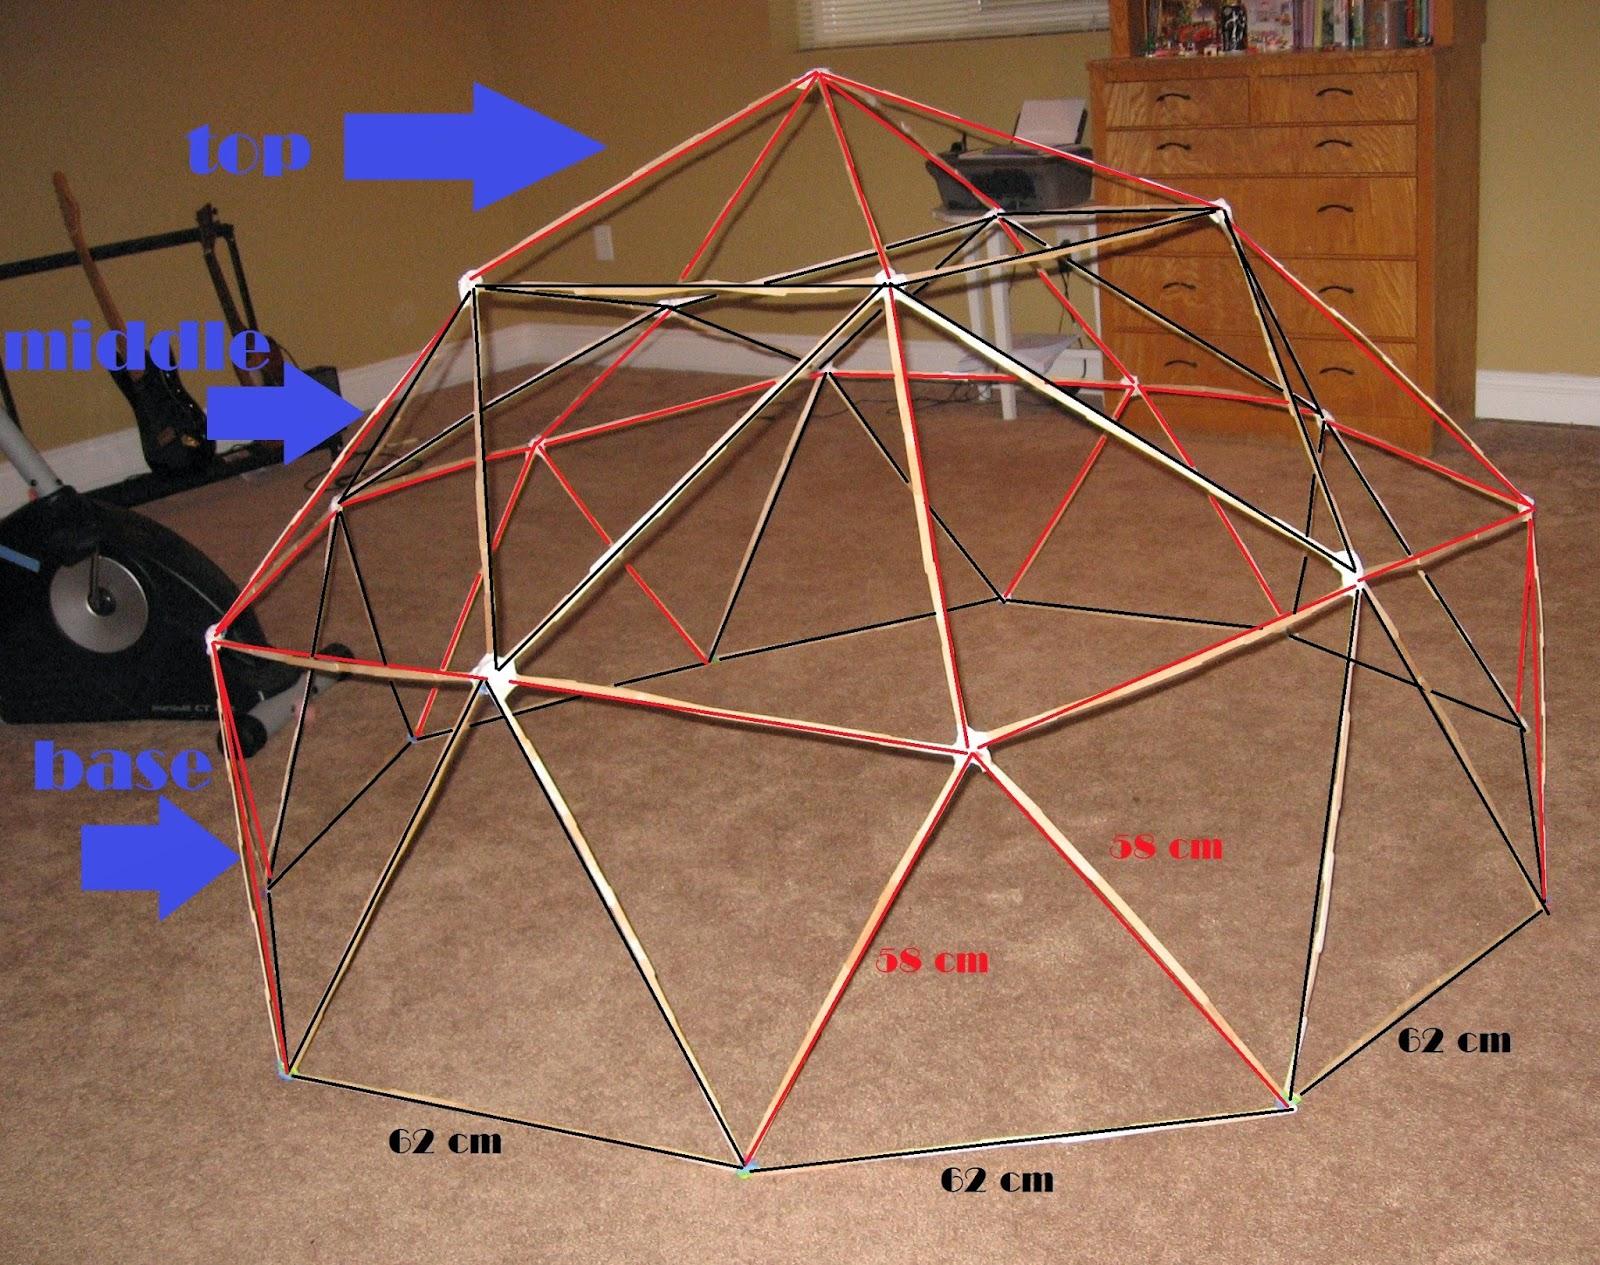 stick model domes rubber tube के लिए इमेज परिणाम